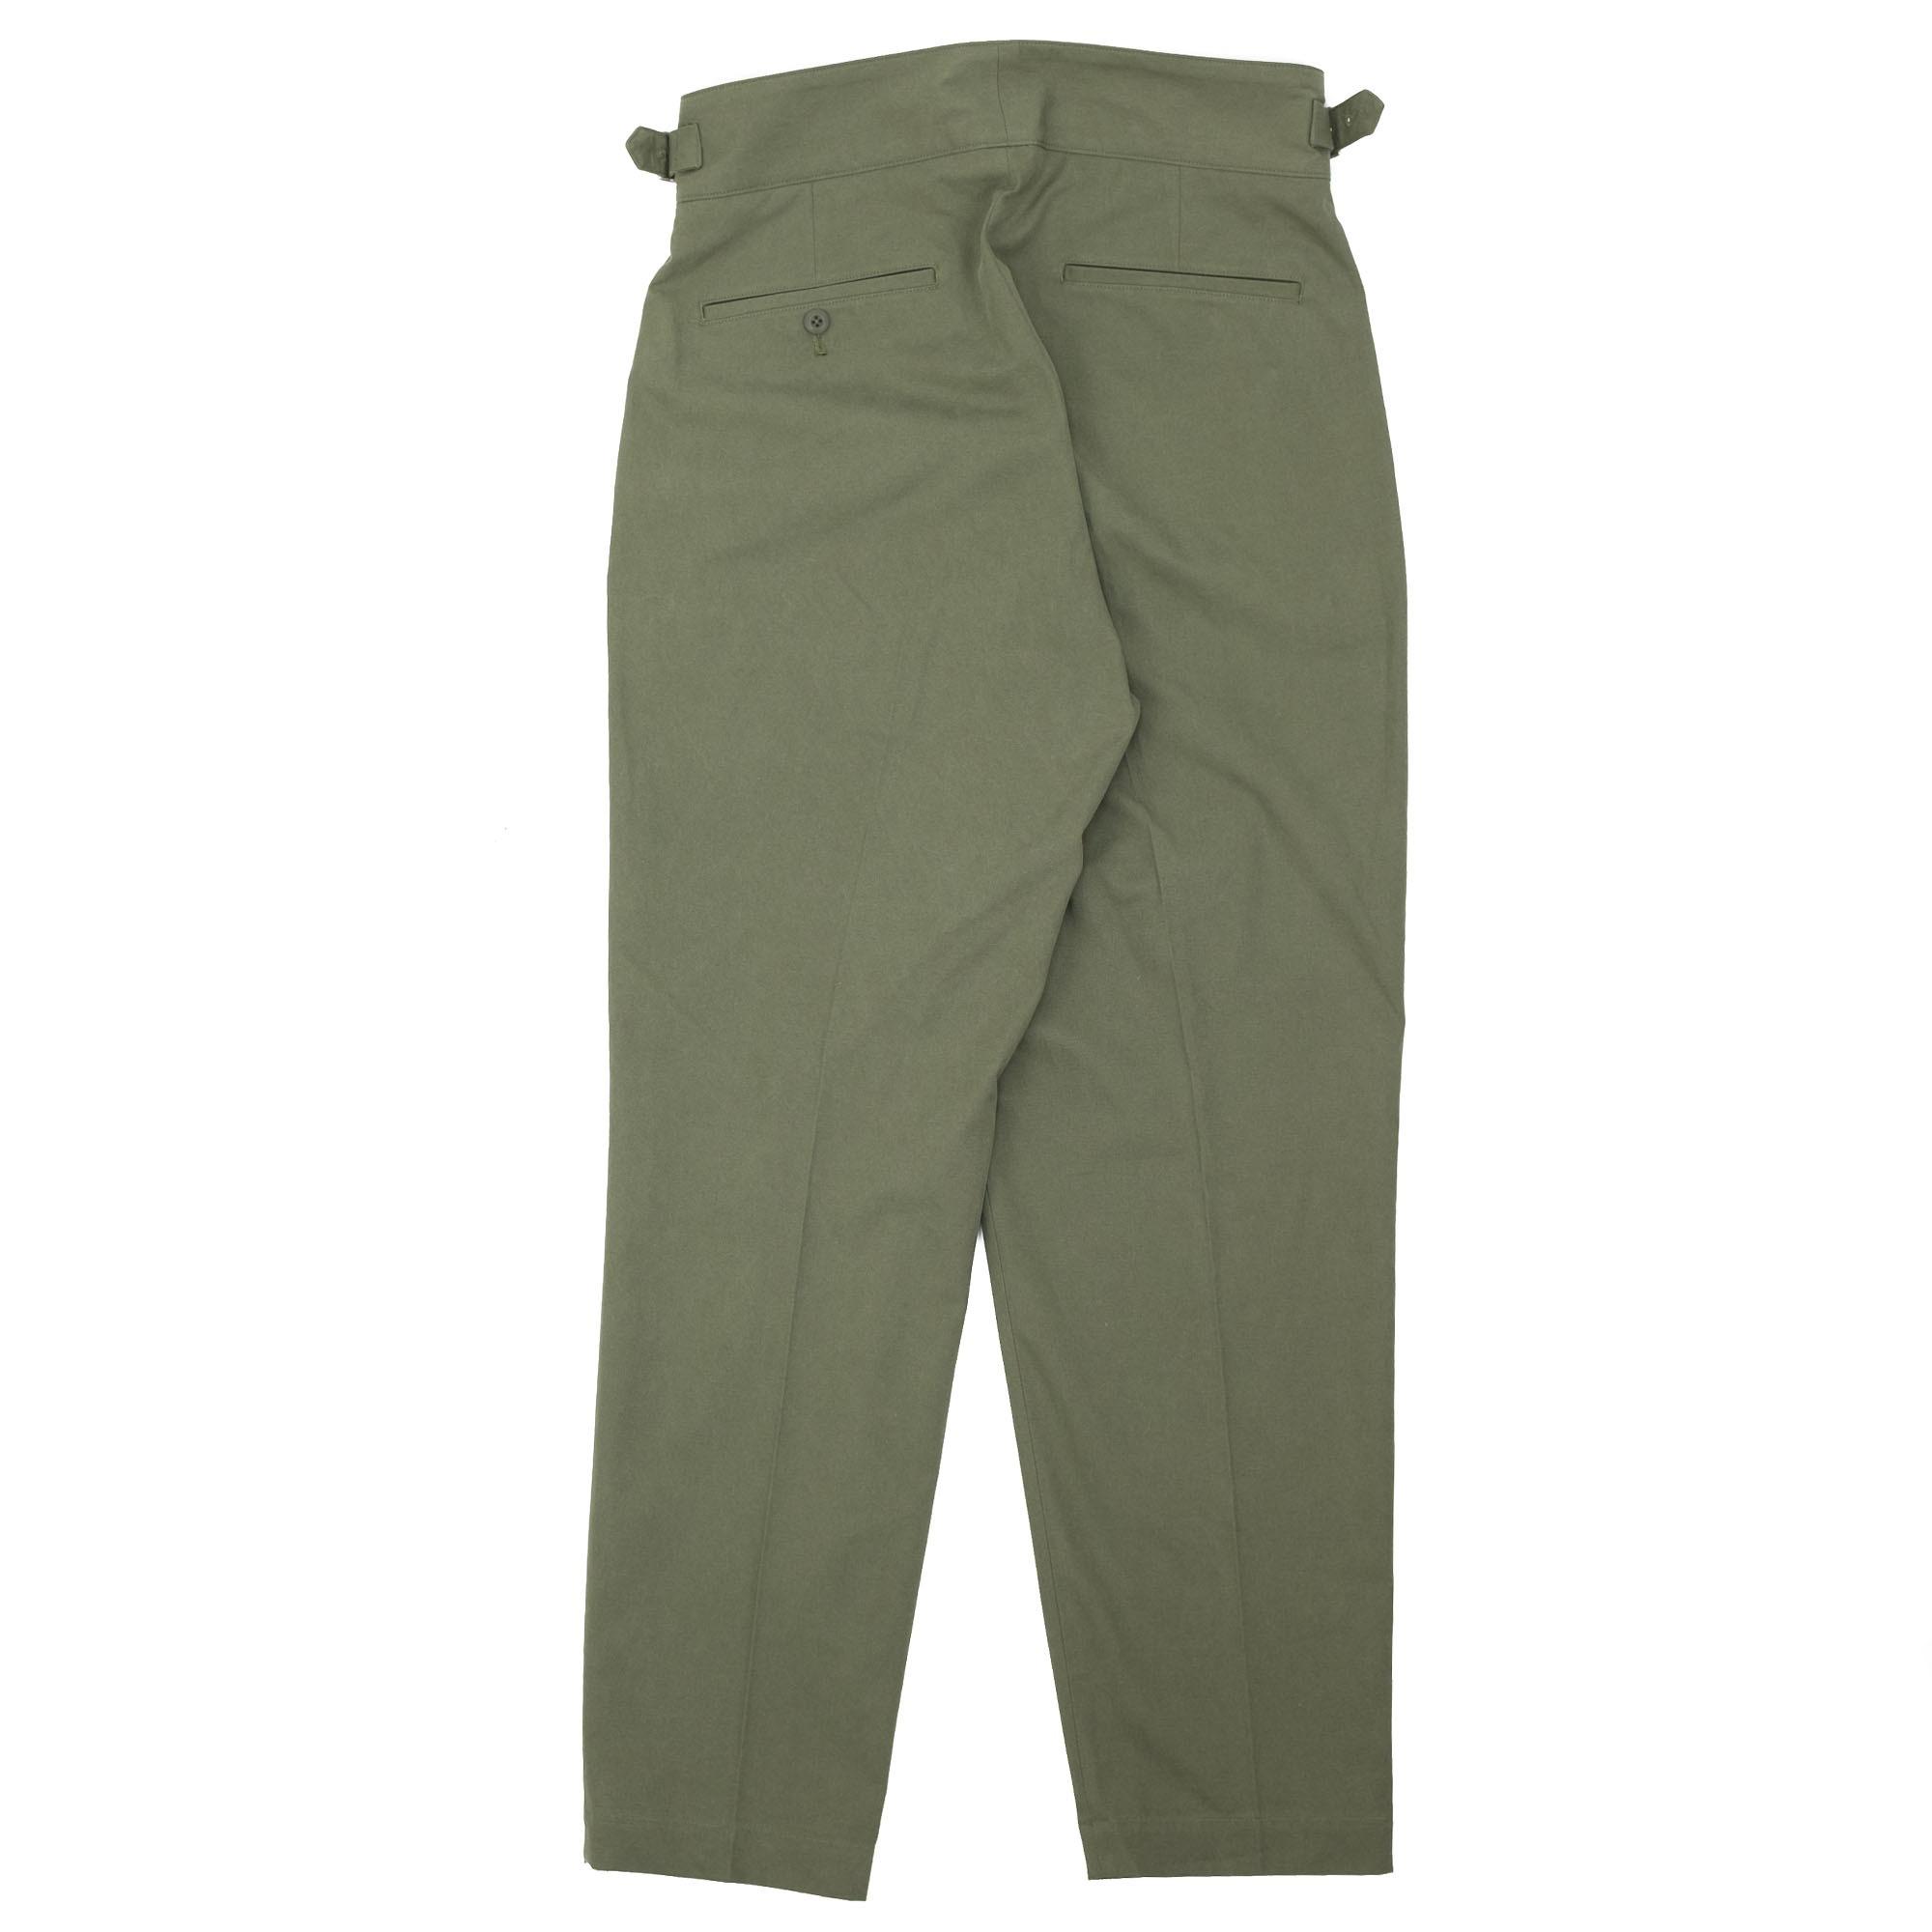 Sulfur Dyed NIDOM Gurkha Pants Khaki 11